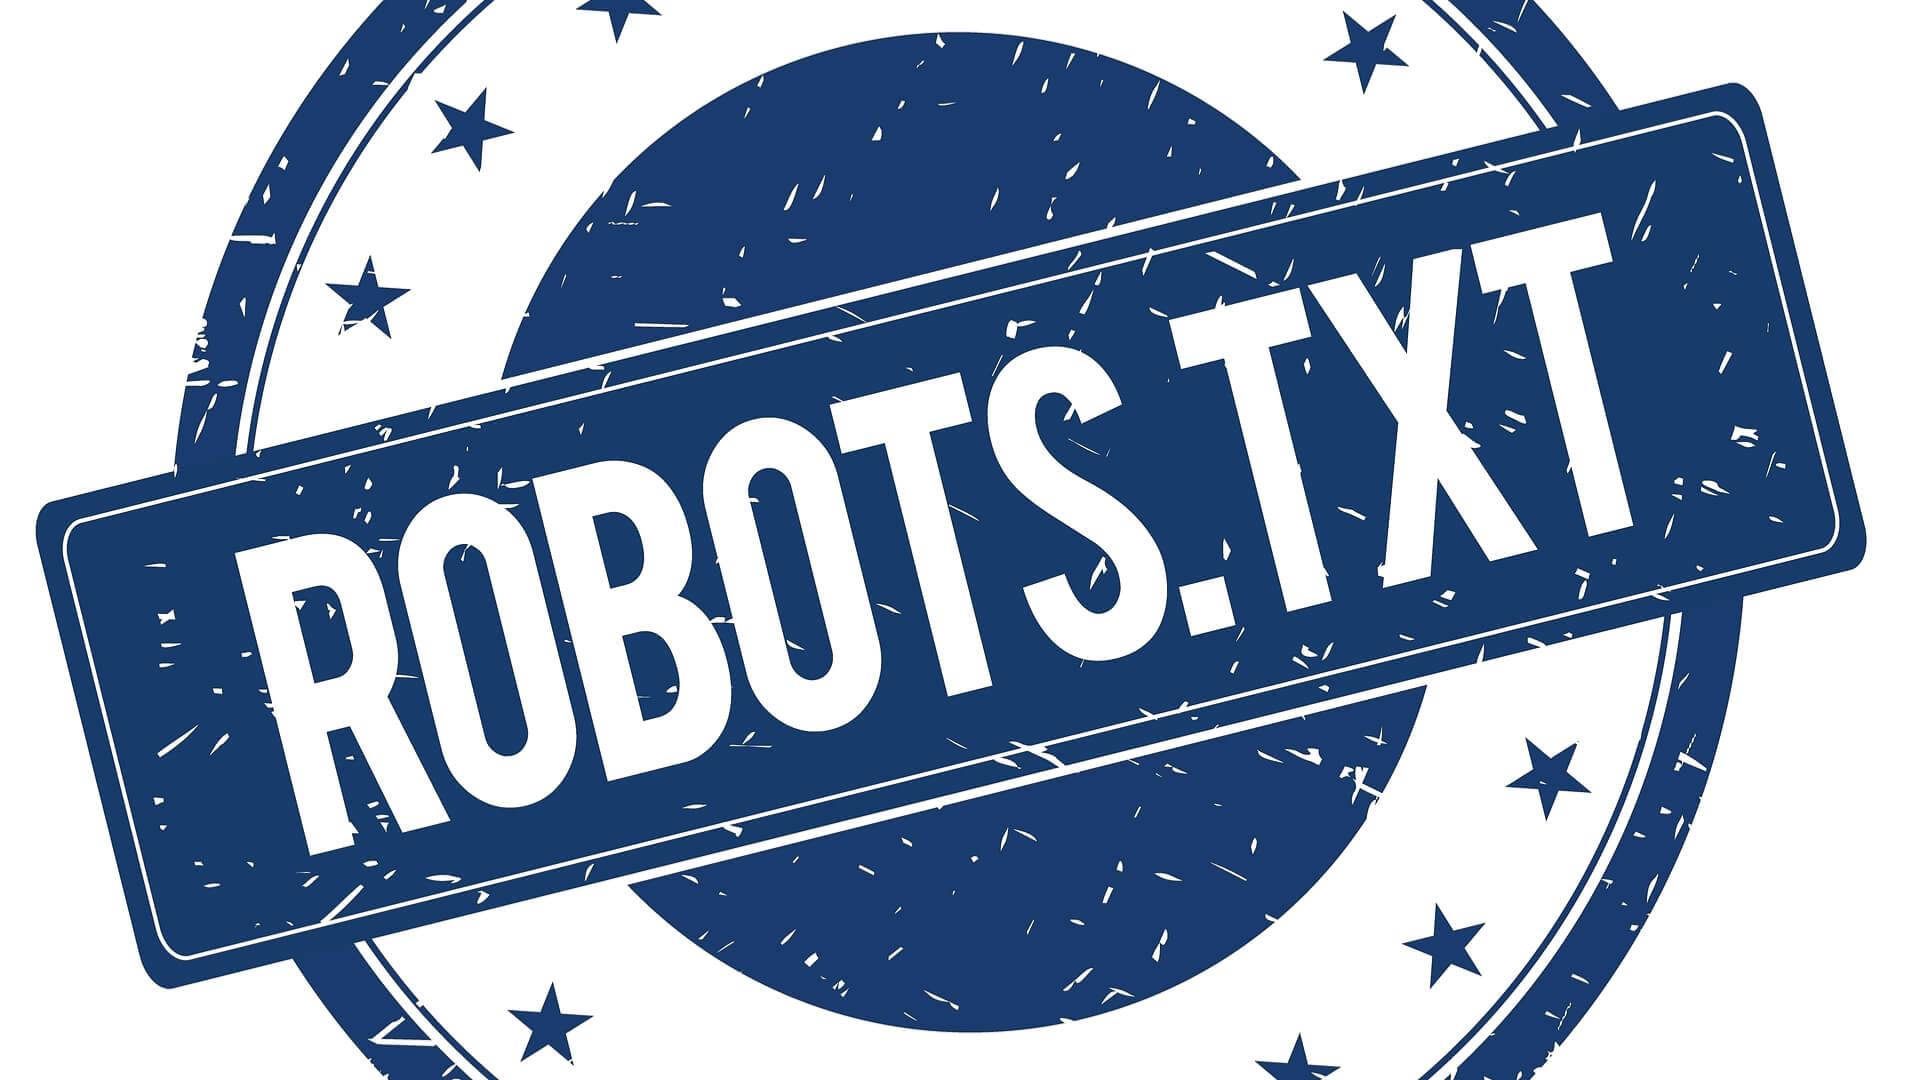 robots-txt-ss-1920